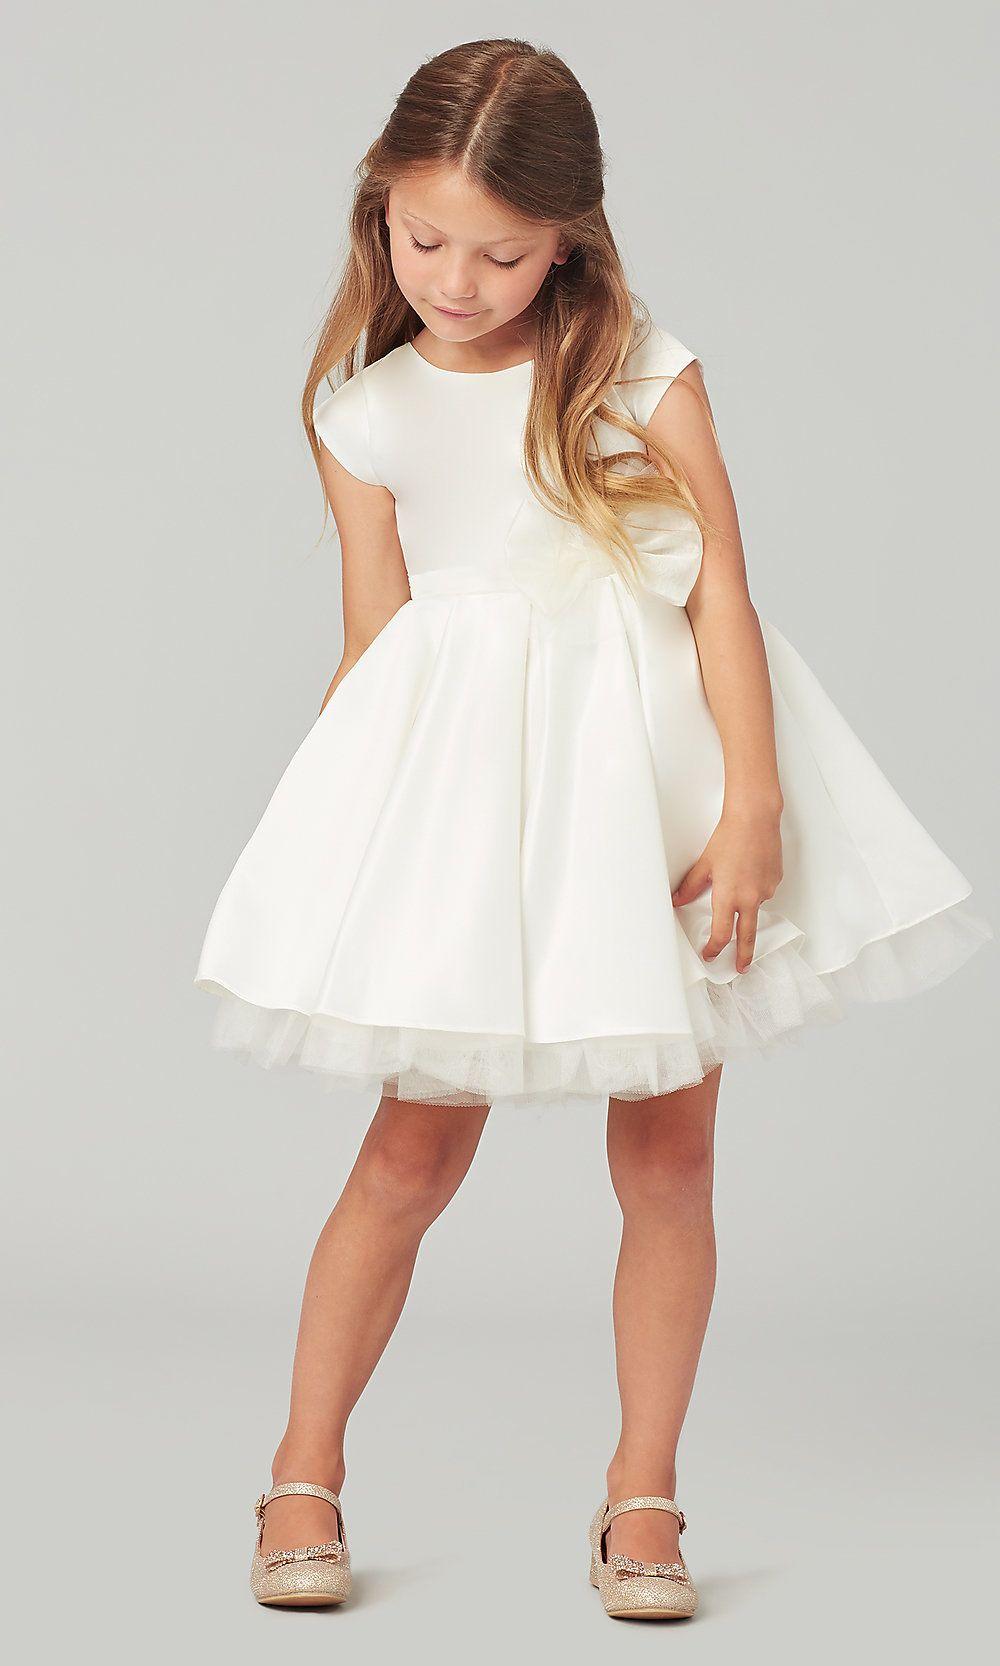 Capsleeve short flowergirl dress with chiffon bow